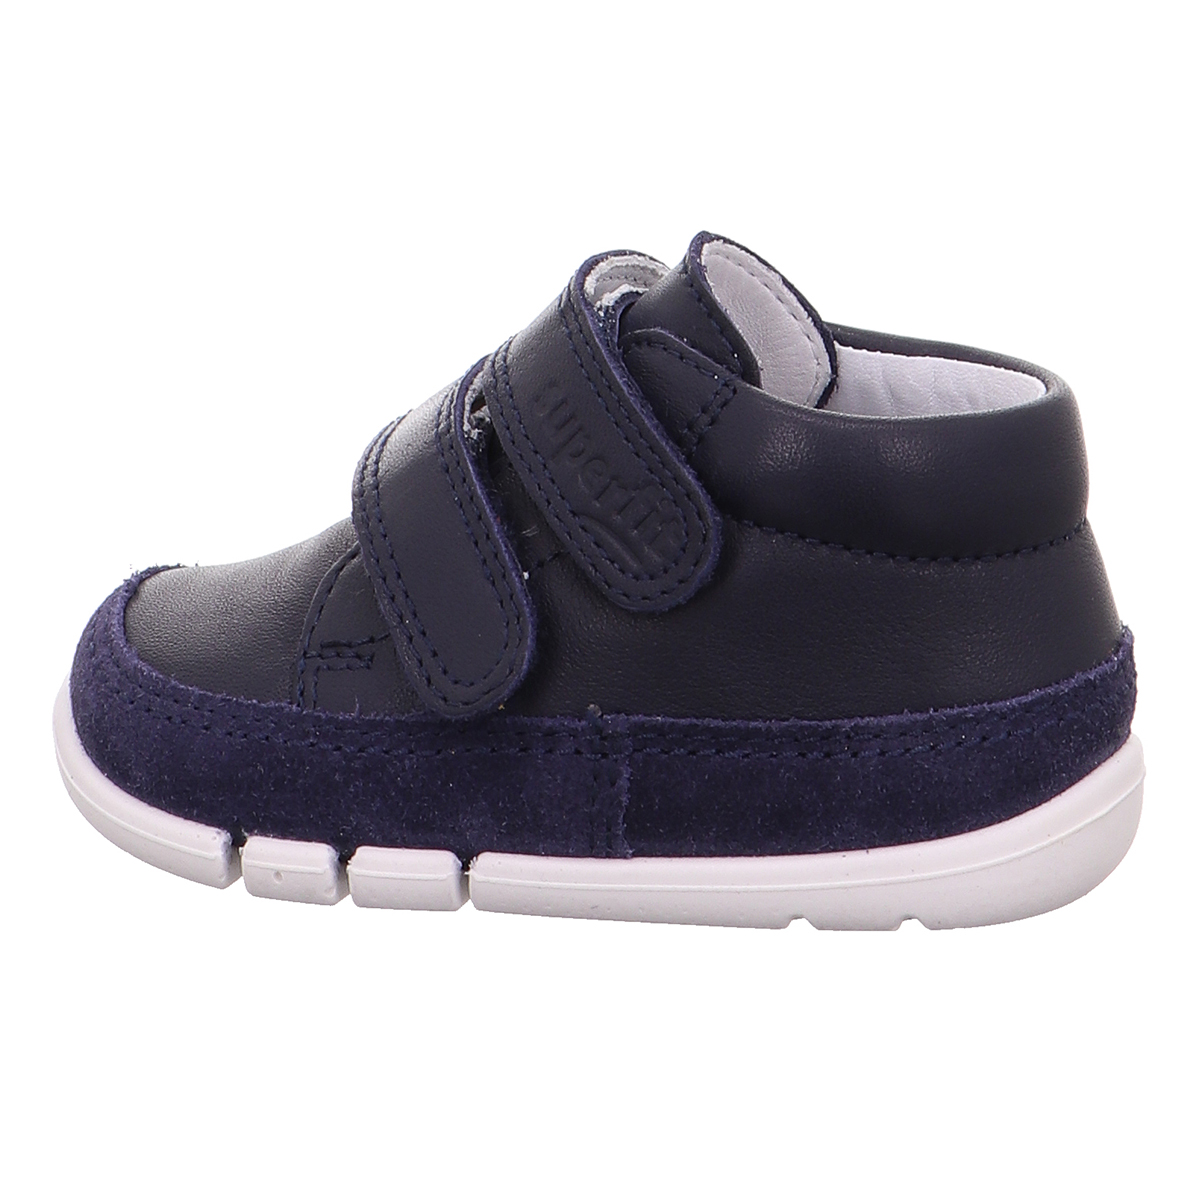 Купить Пинетки-ботинки Superfit Sport Blue, р. 22 1-006341-8000 ТМ: Superfit, синий